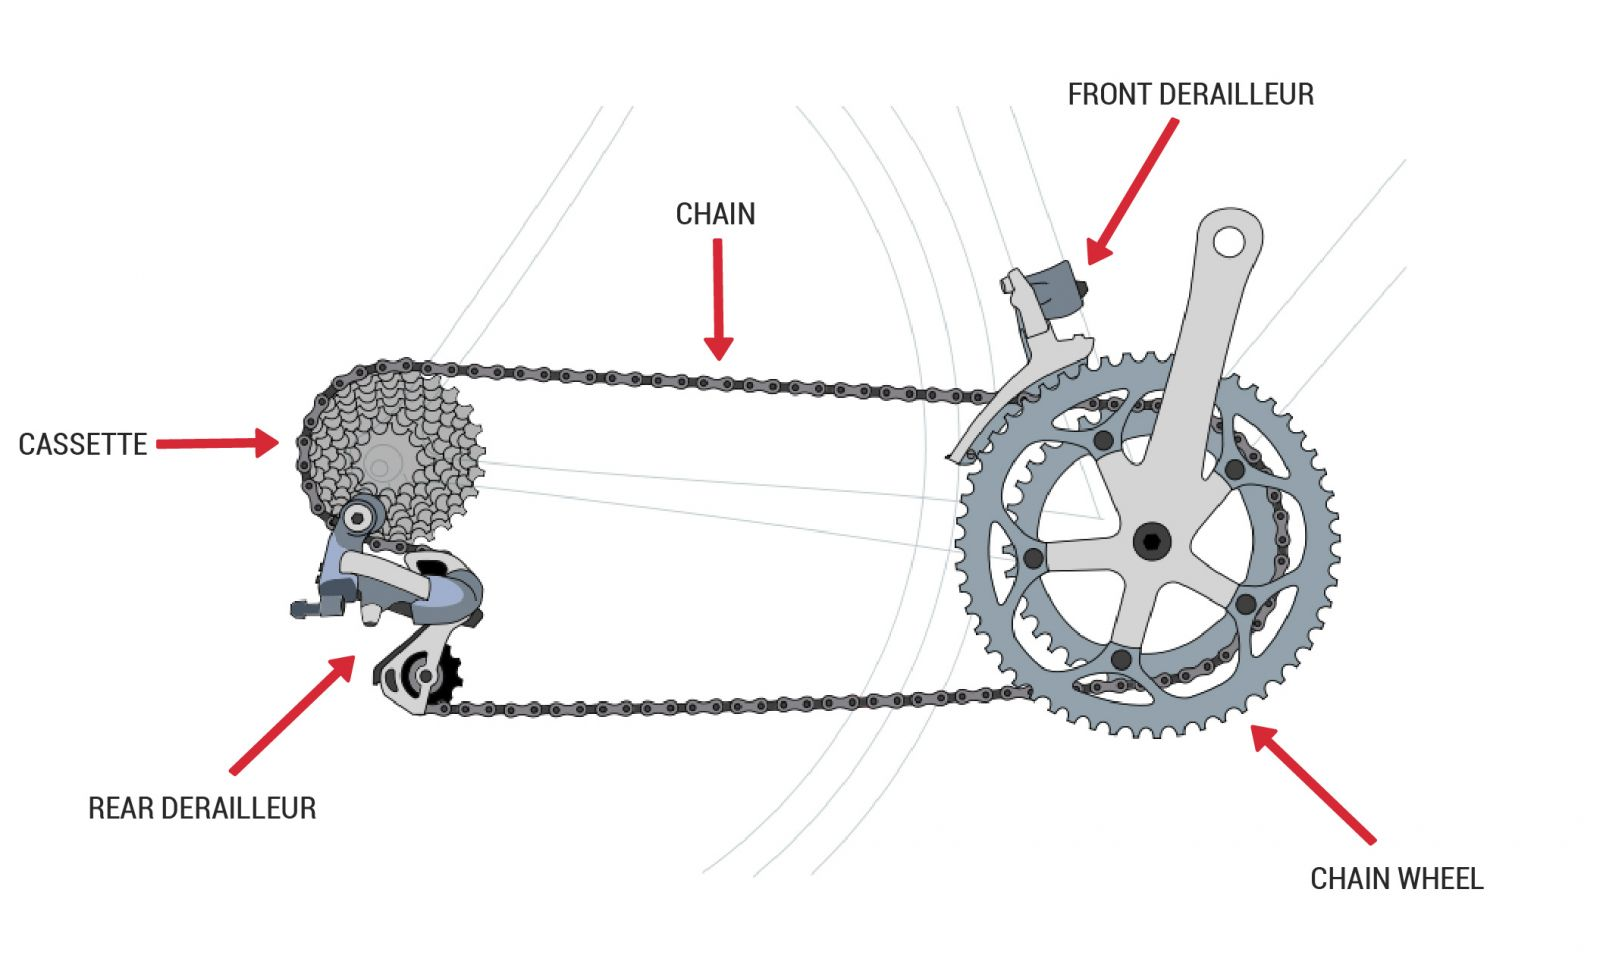 Fixed Gear Bike Parts Diagram Wiring Diagram